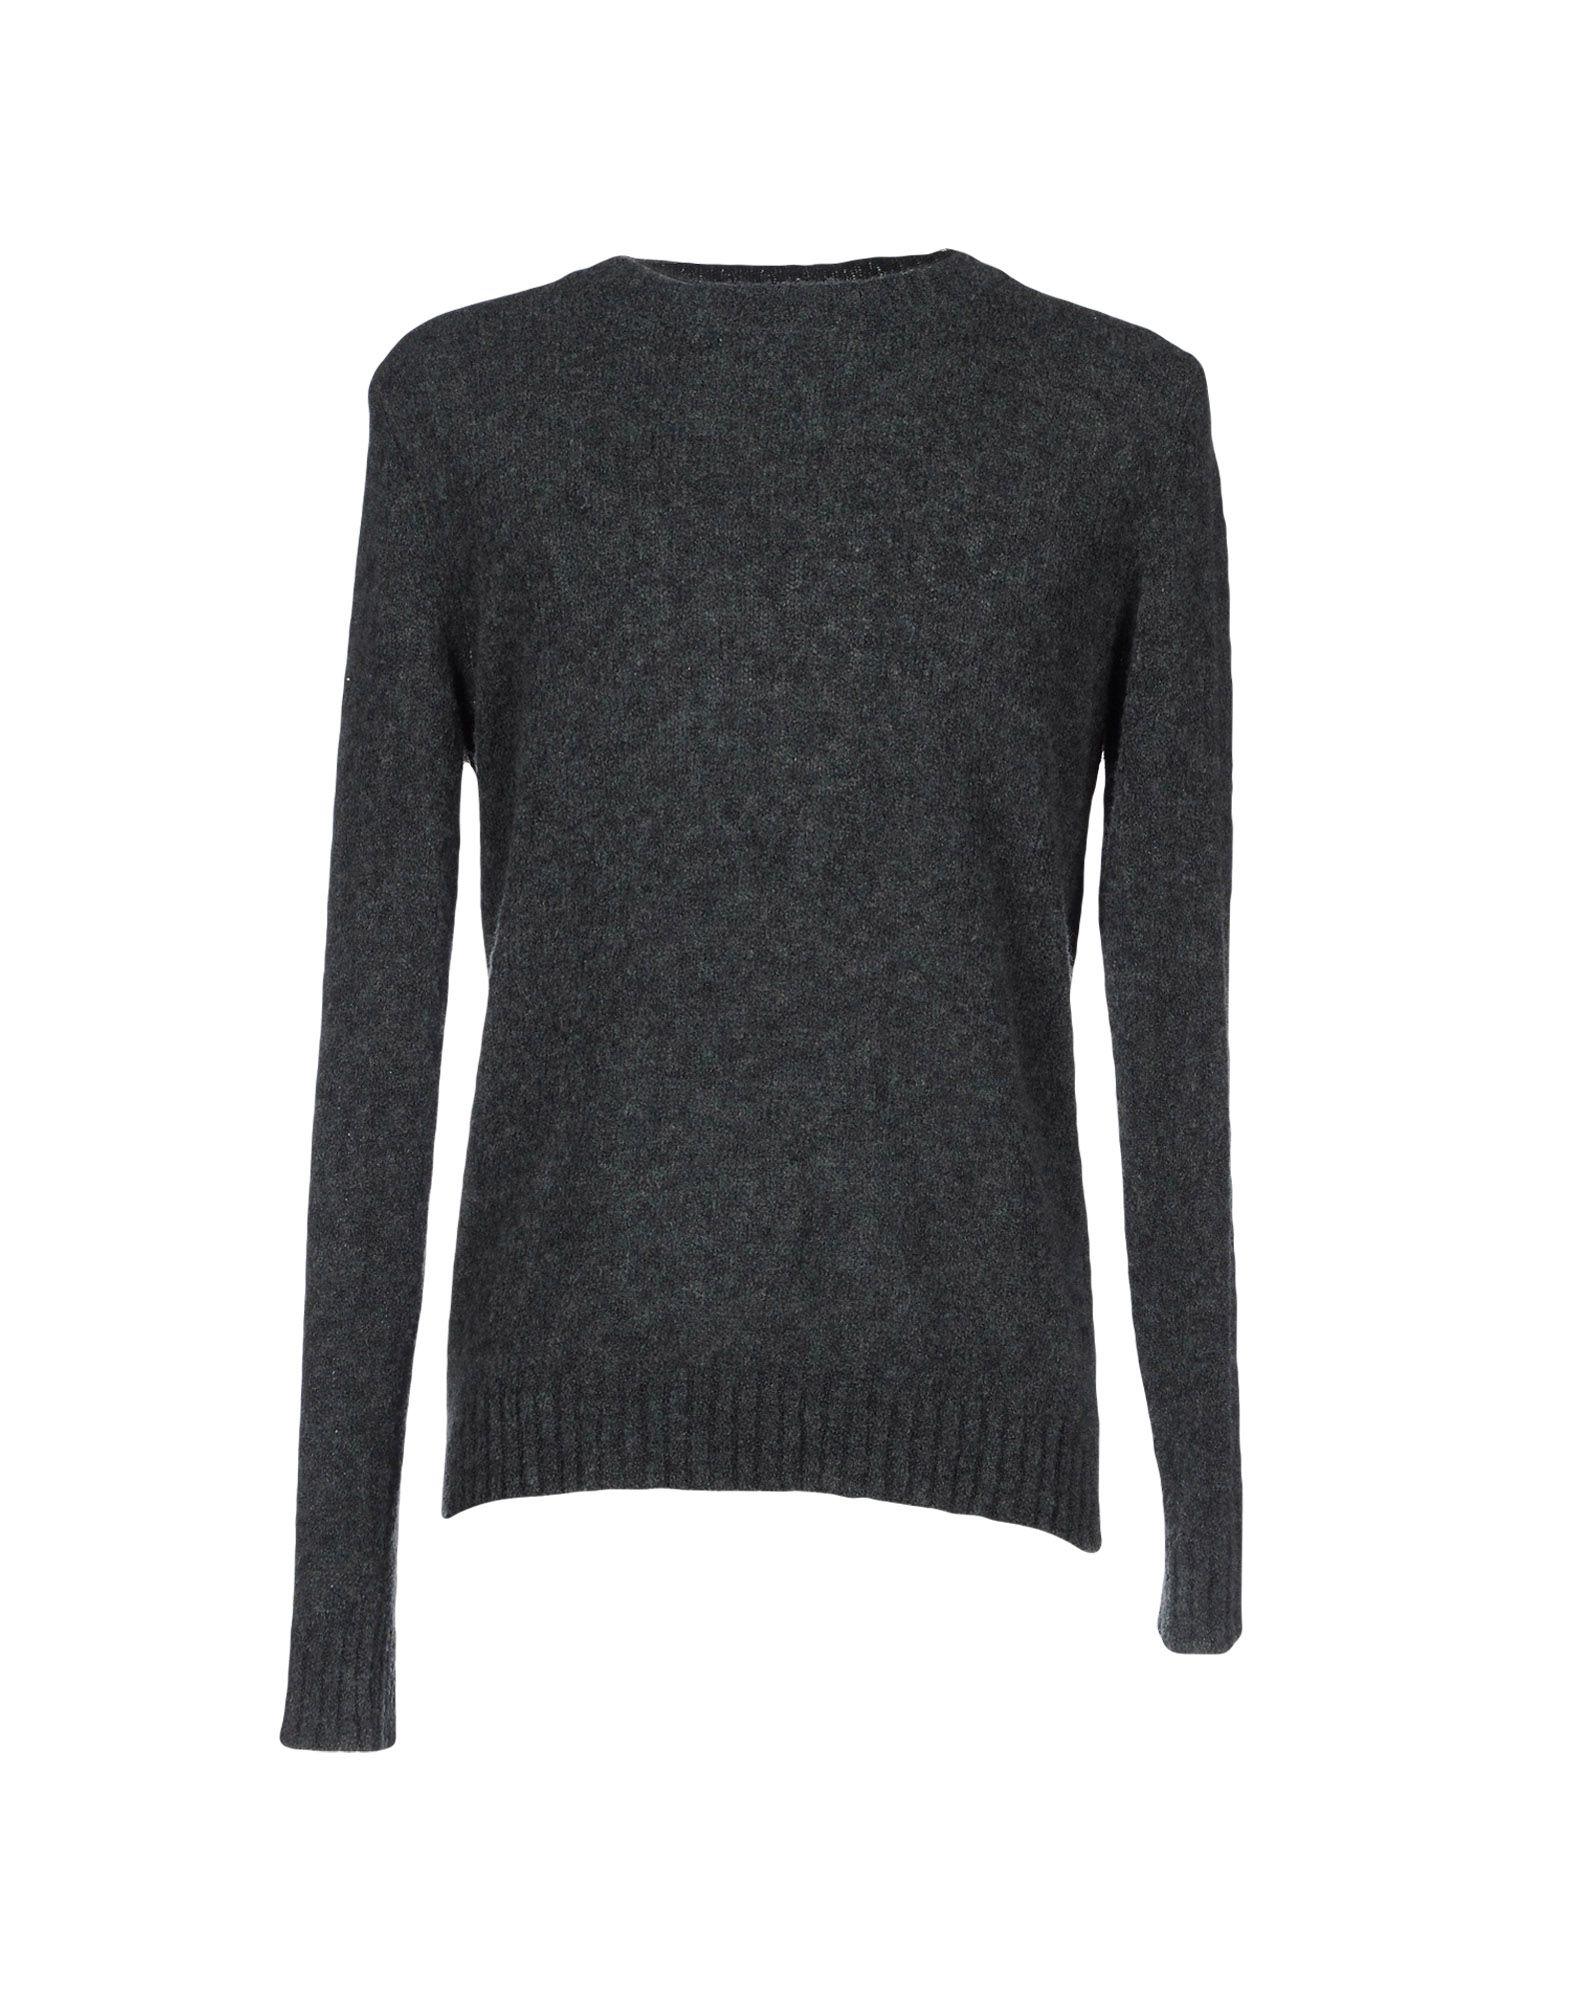 AUTHENTIC ORIGINAL VINTAGE STYLE Свитер stussy authentic gear свитер